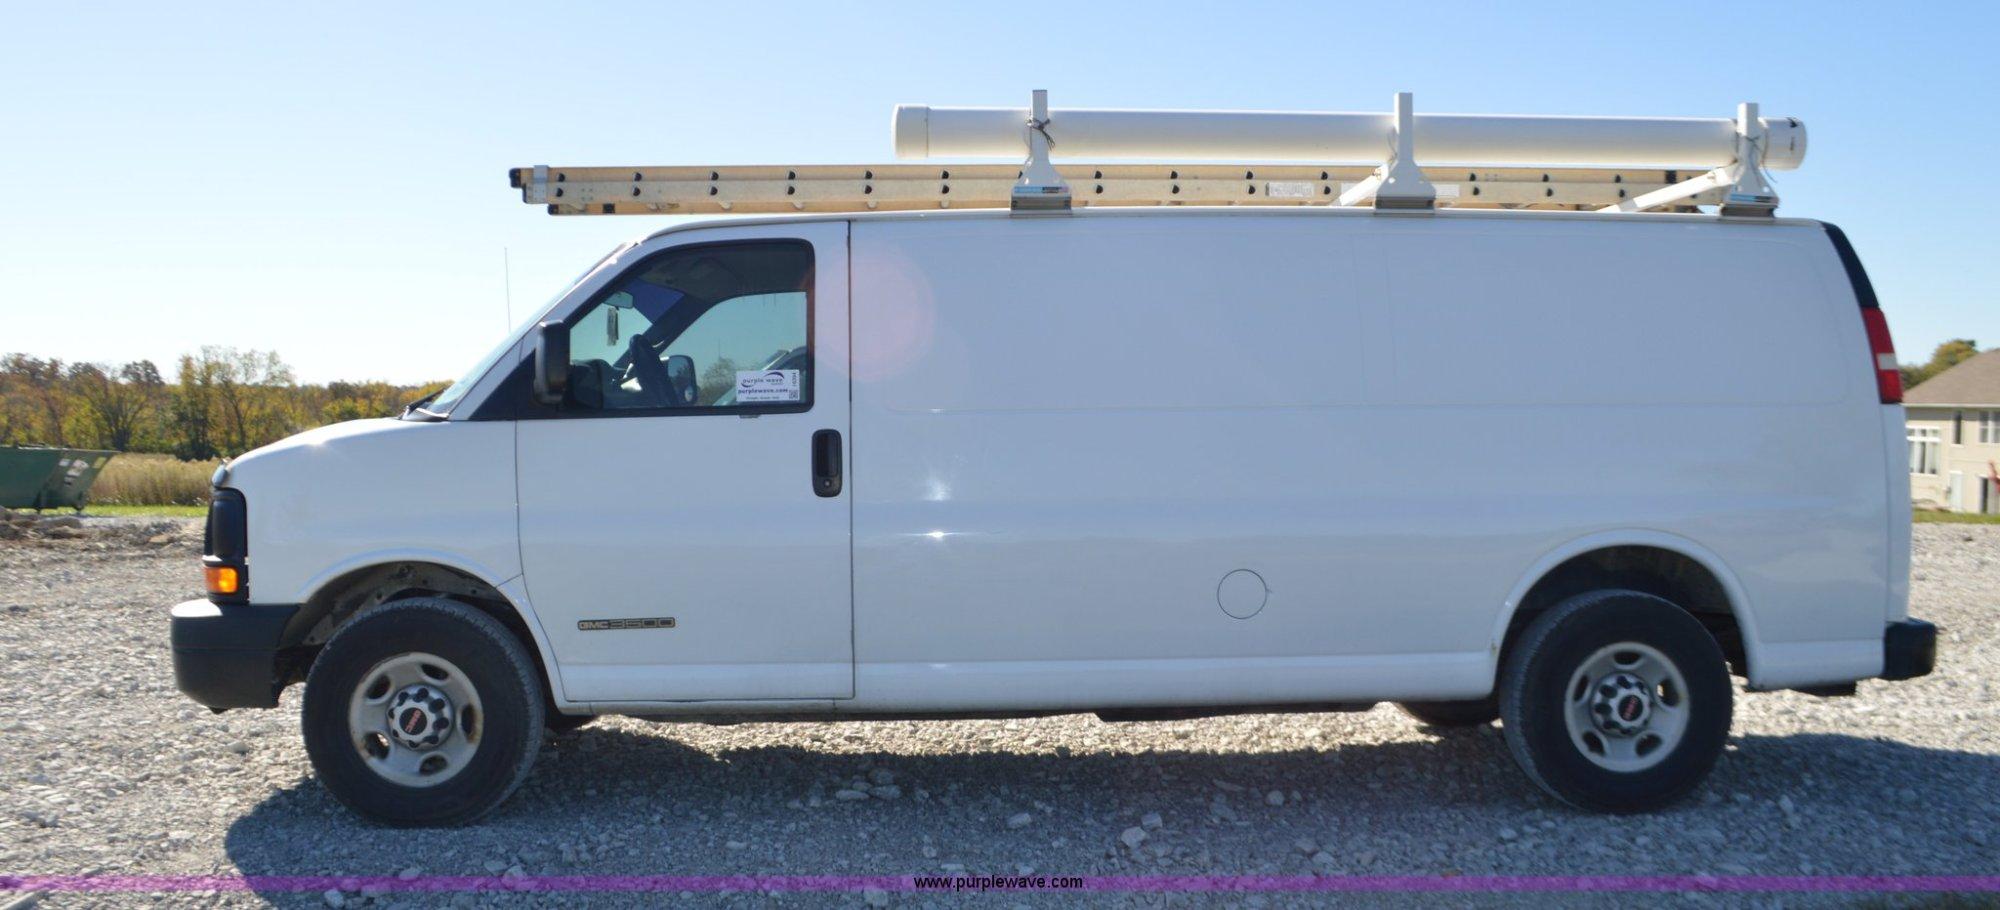 hight resolution of  2006 gmc savana g3500 van full size in new window